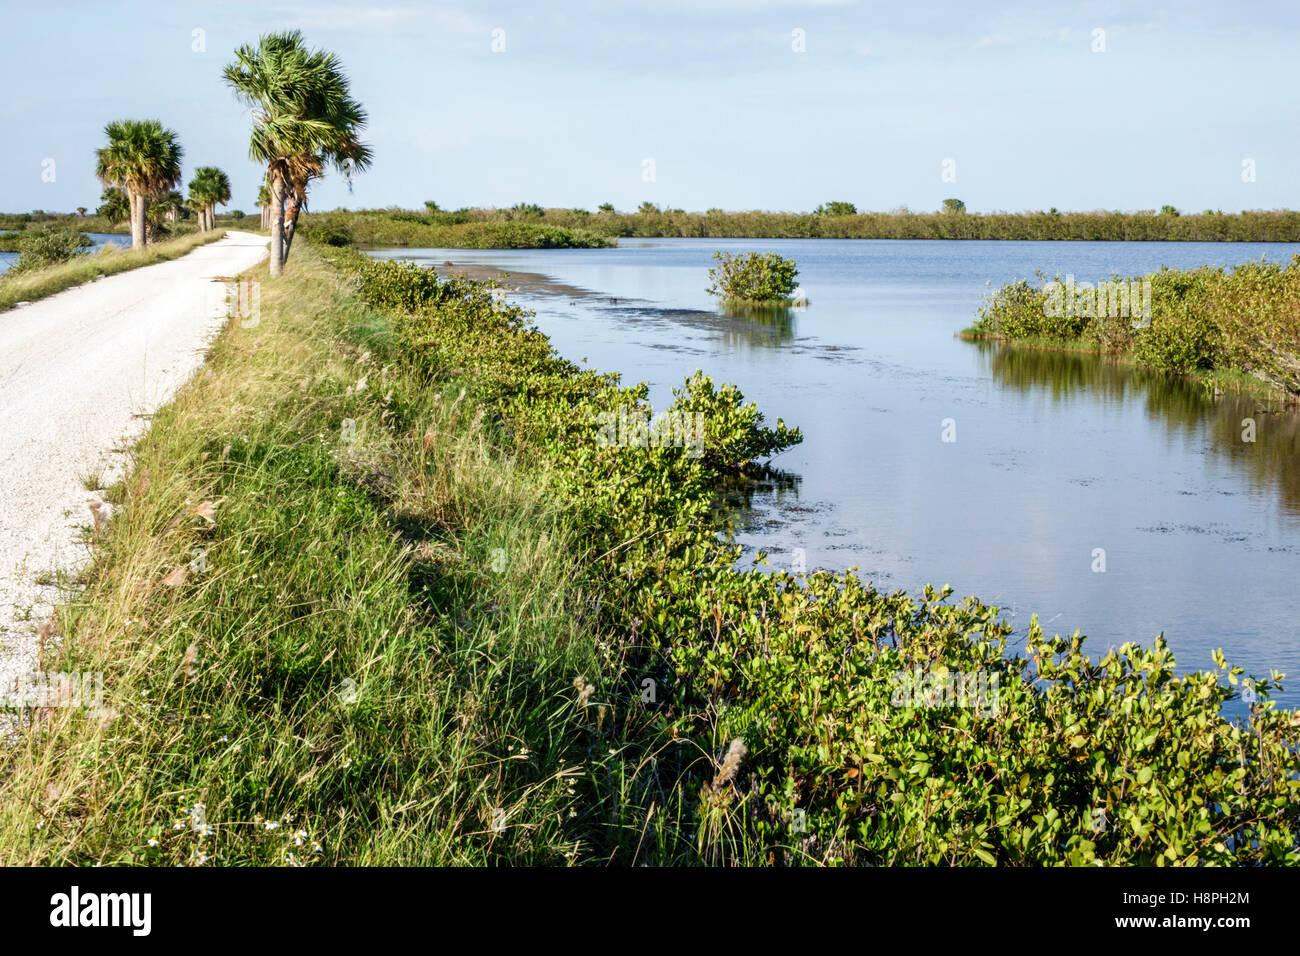 Merritt Island Florida Merritt Island National Wildlife Refuge Punto negro Unidad silvestre paisaje de agua Imagen De Stock